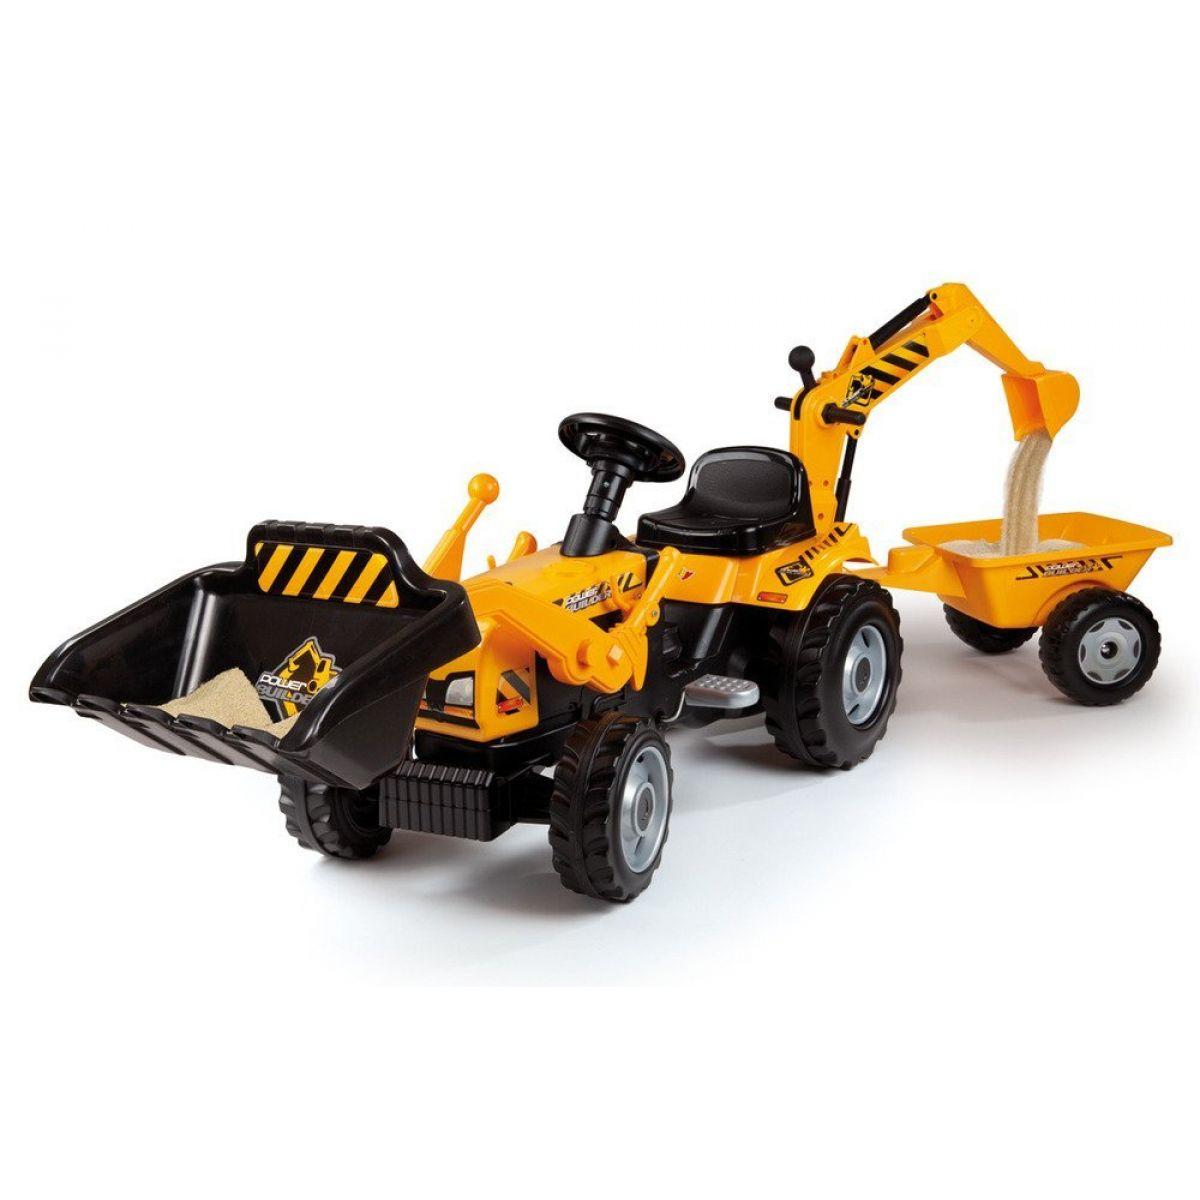 Smoby Šlapací traktor Max s bagrem a vozíkem